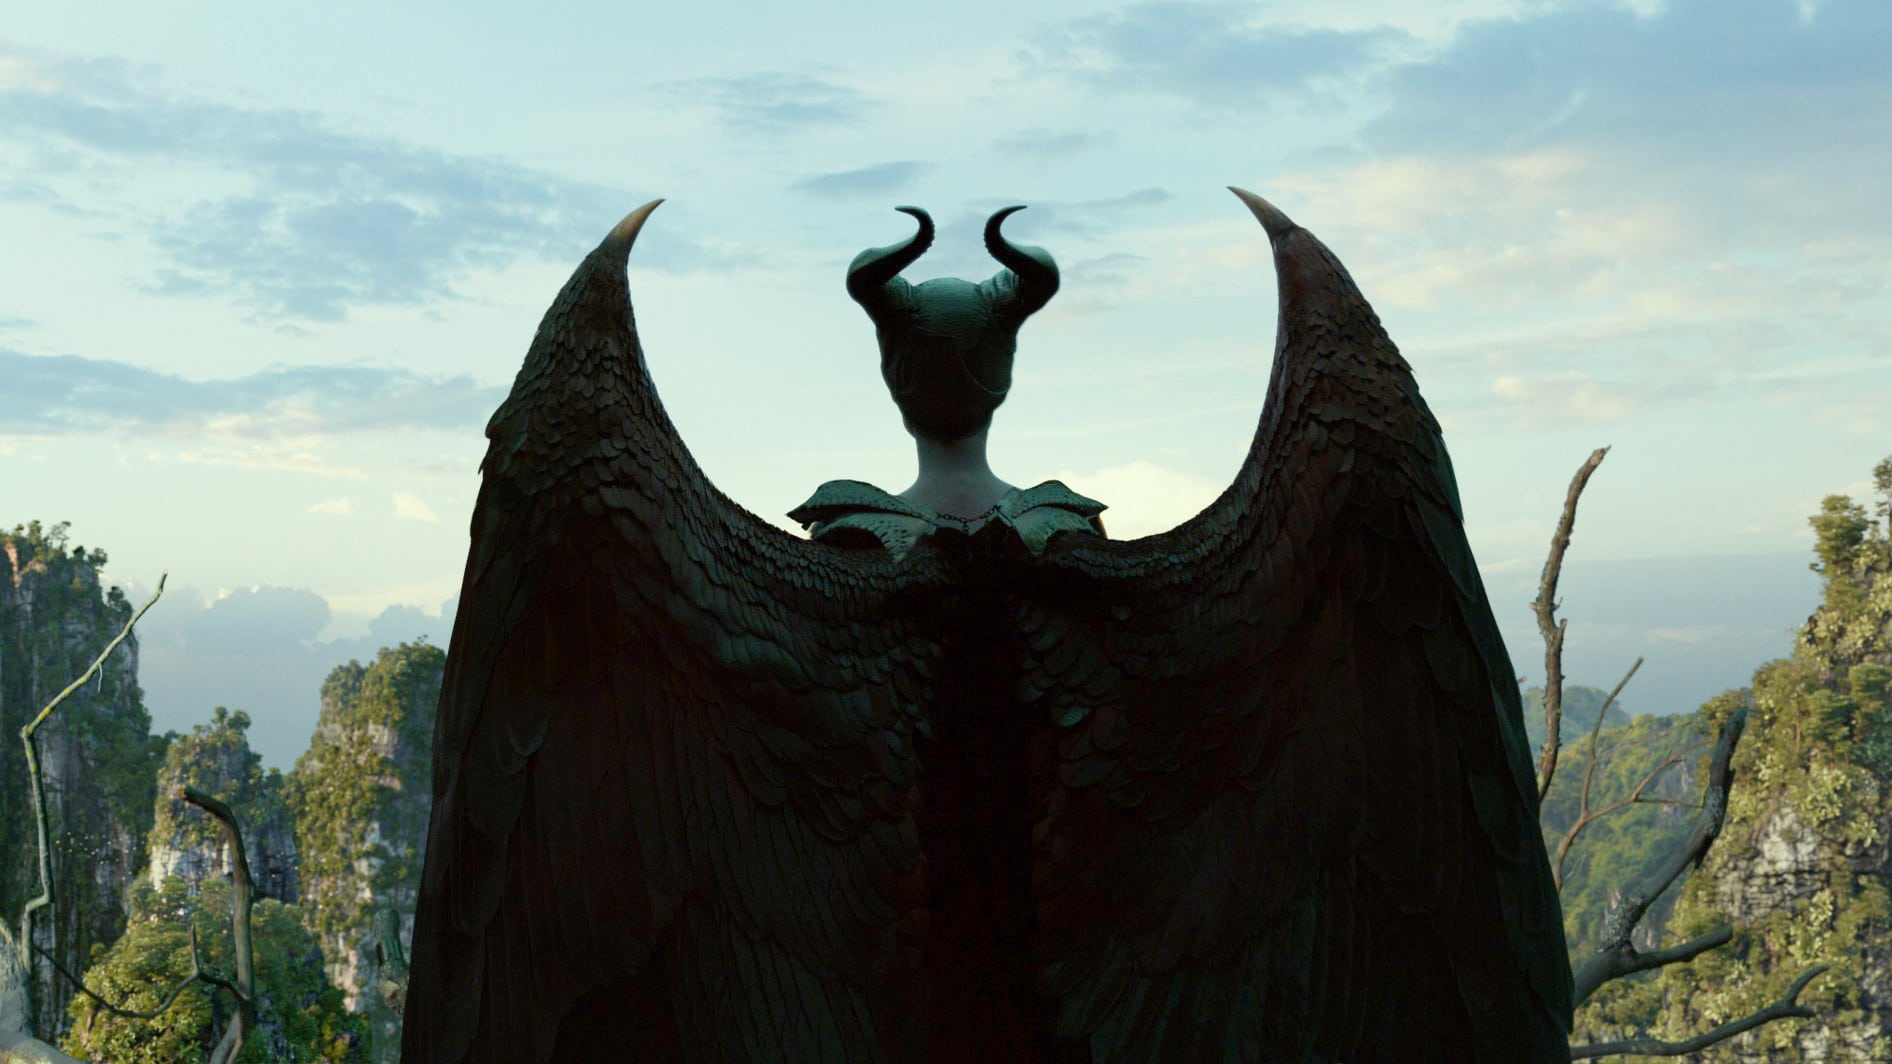 Maleficent: Mistress of Evil backdrop